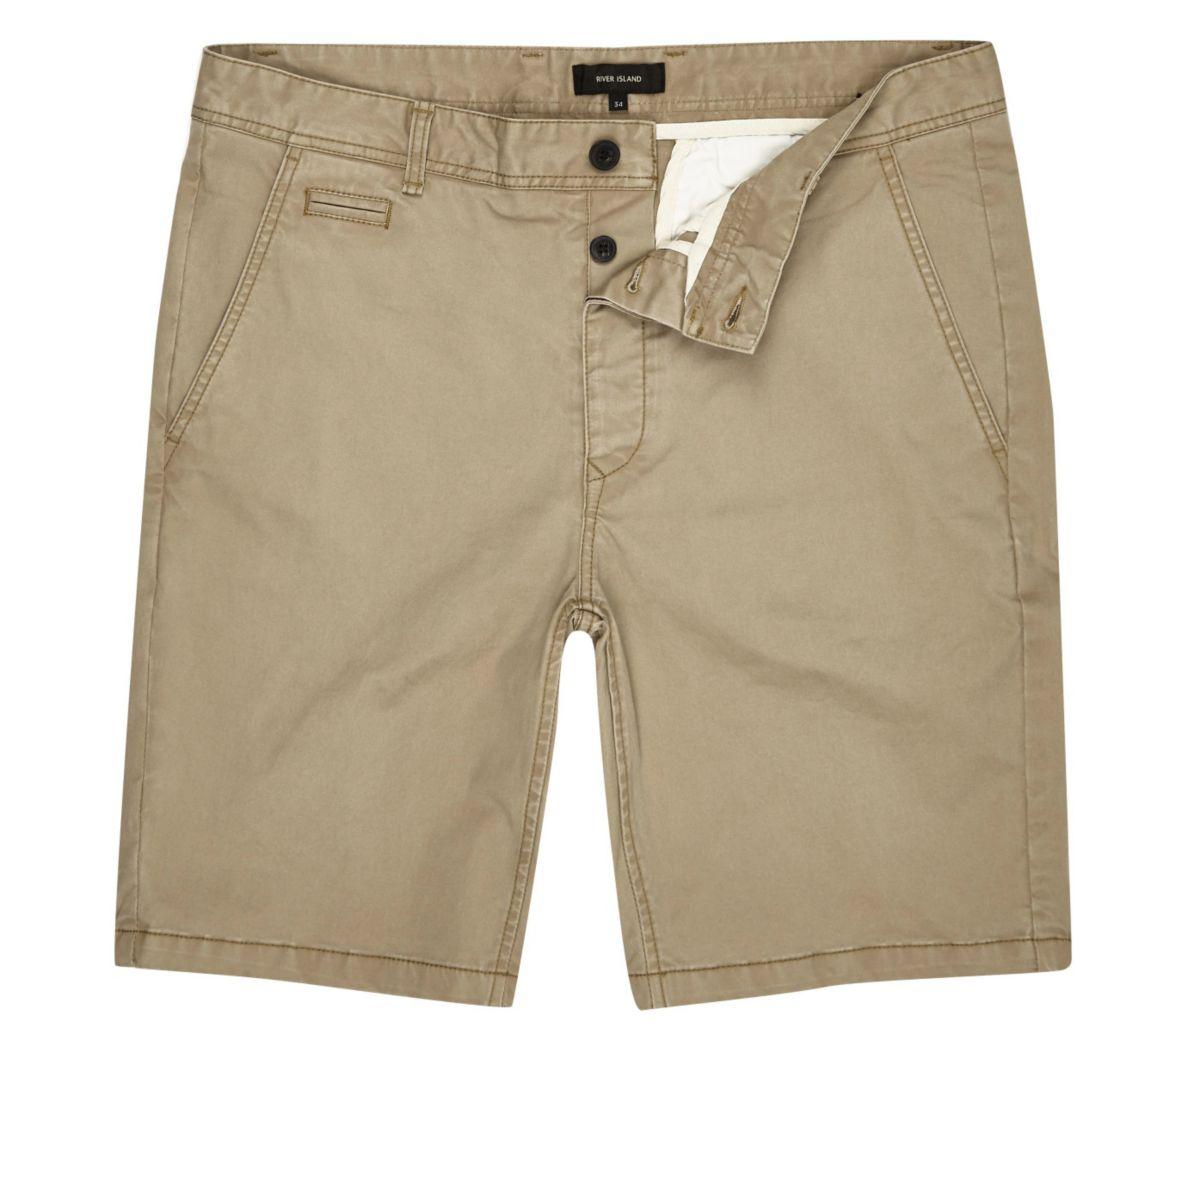 Tan slim fit chino shorts